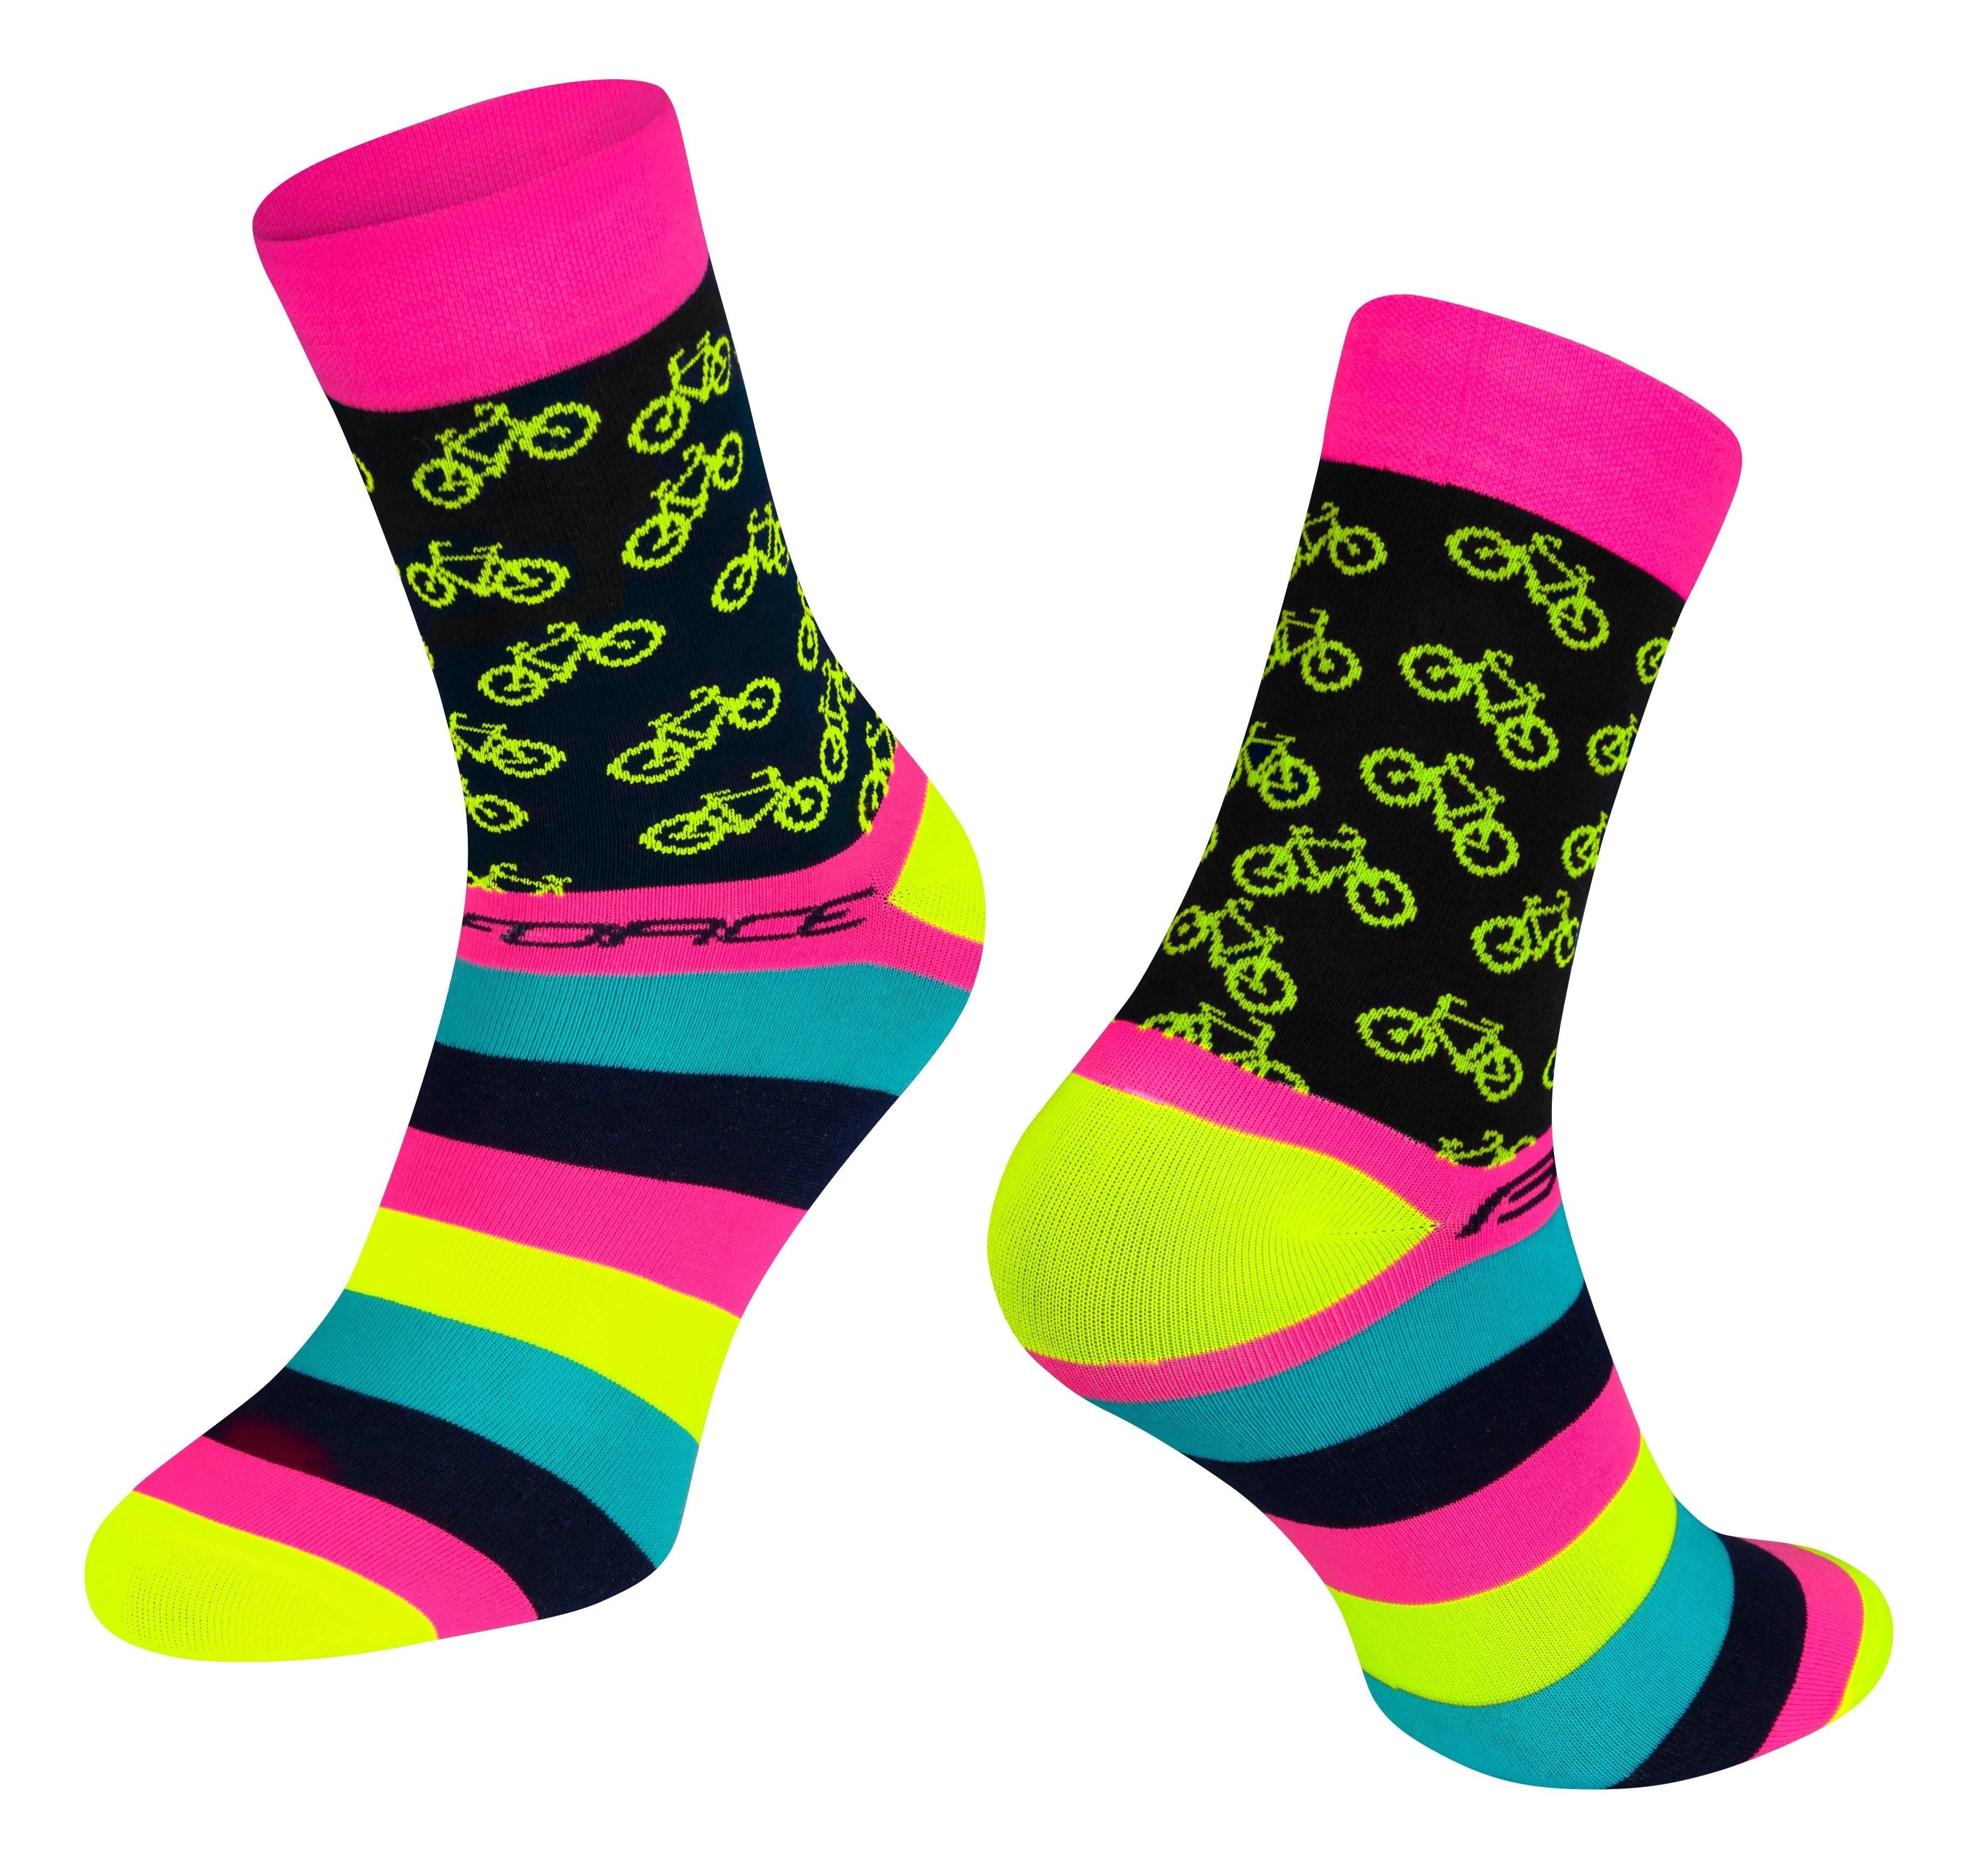 ponožky FORCE CYCLE, růžové L-XL/42-46